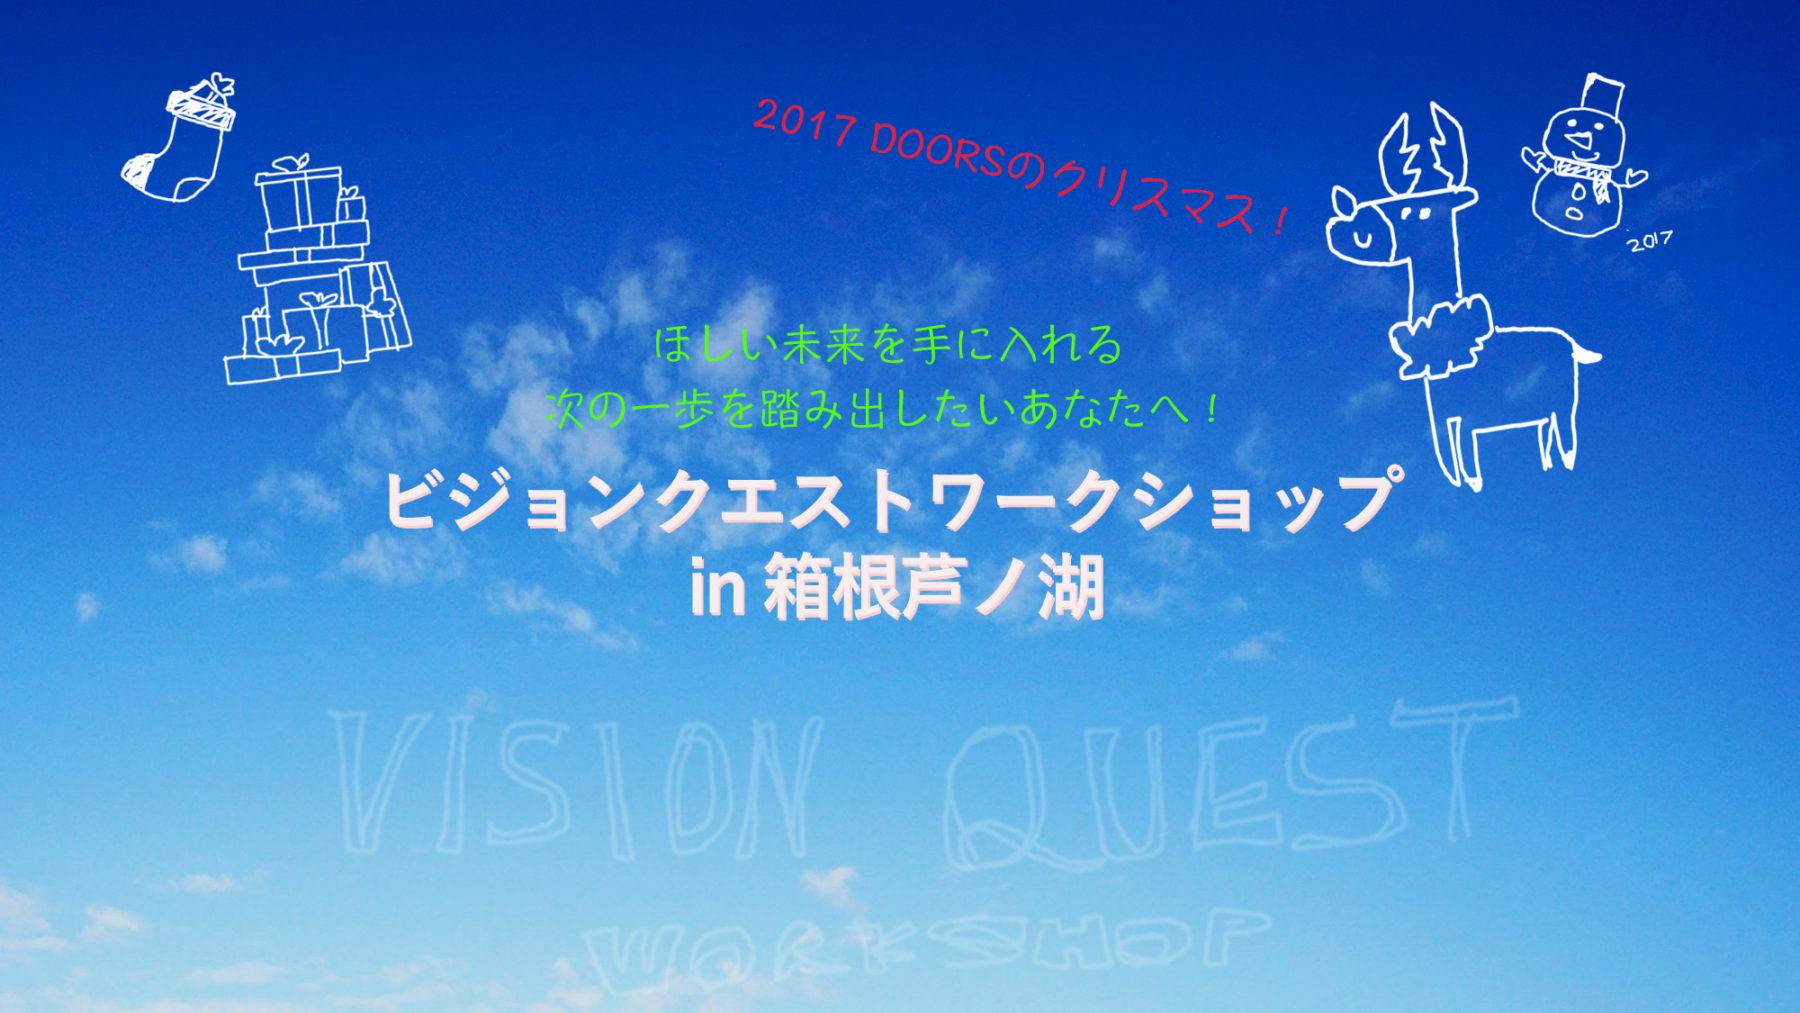 visionquest_top